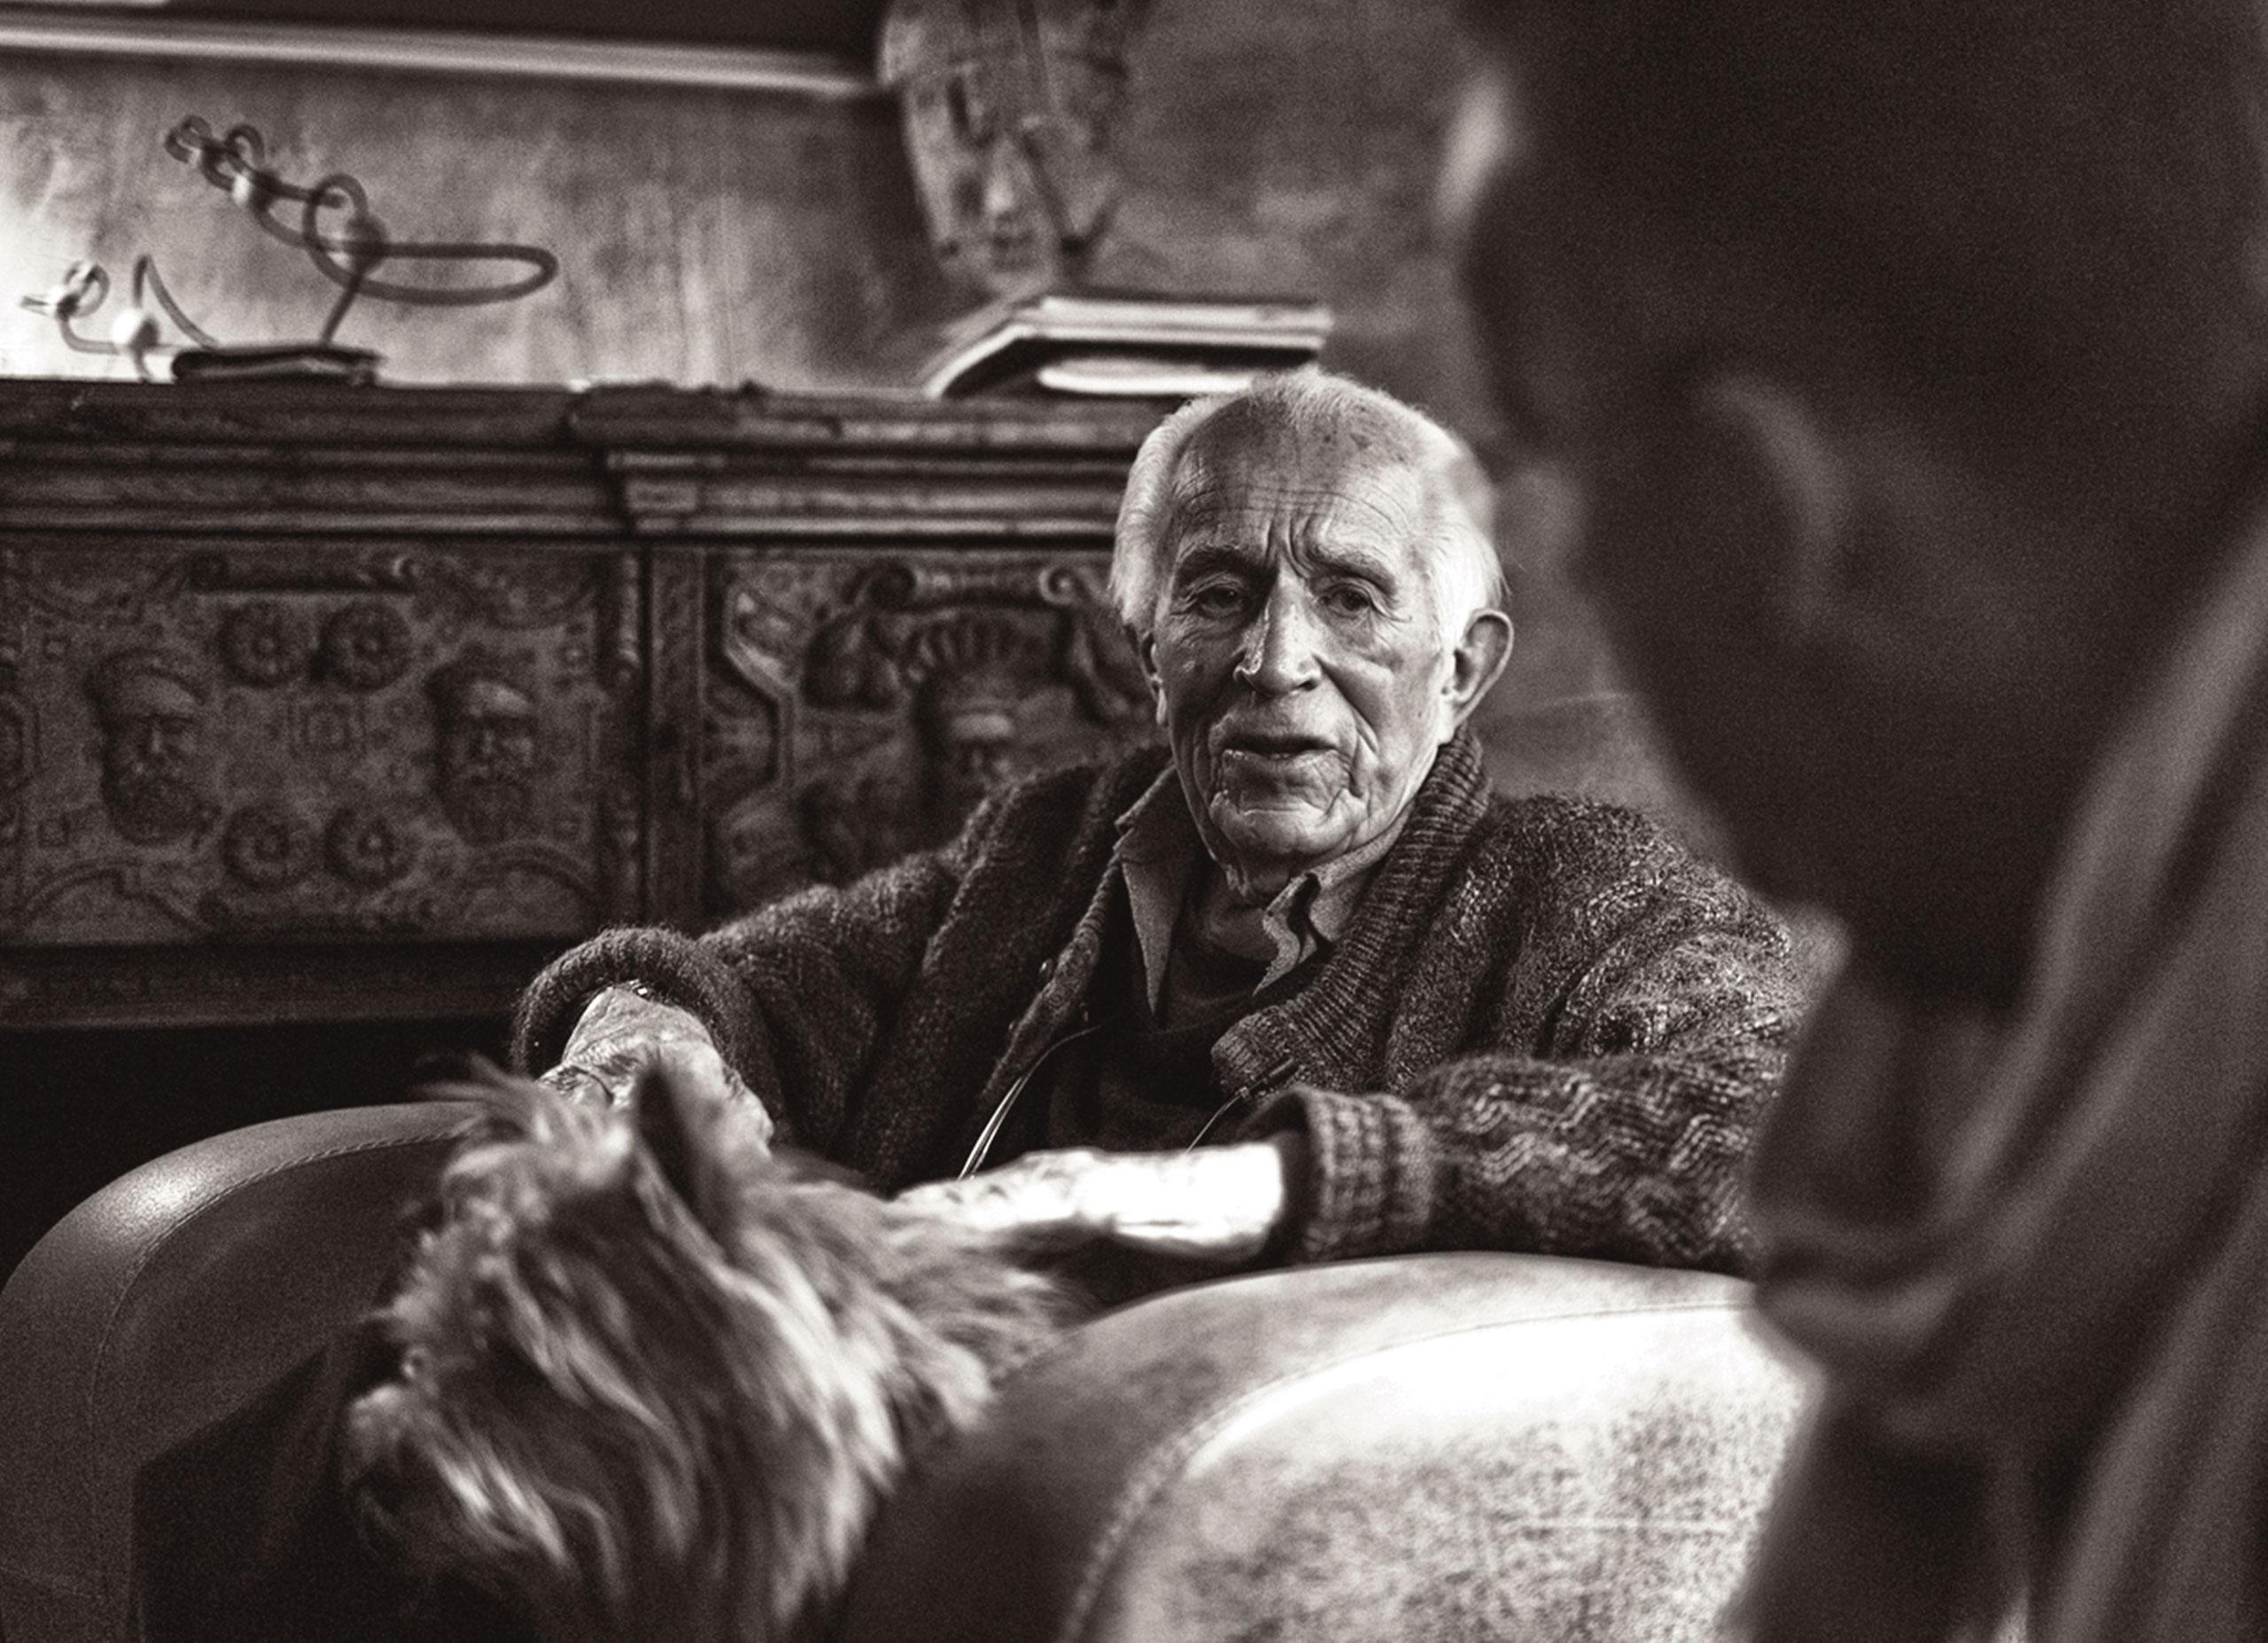 Photographer David Douglas Duncan on his 98th birthday. January 23, 2014, Castellaras le Vieux, France.